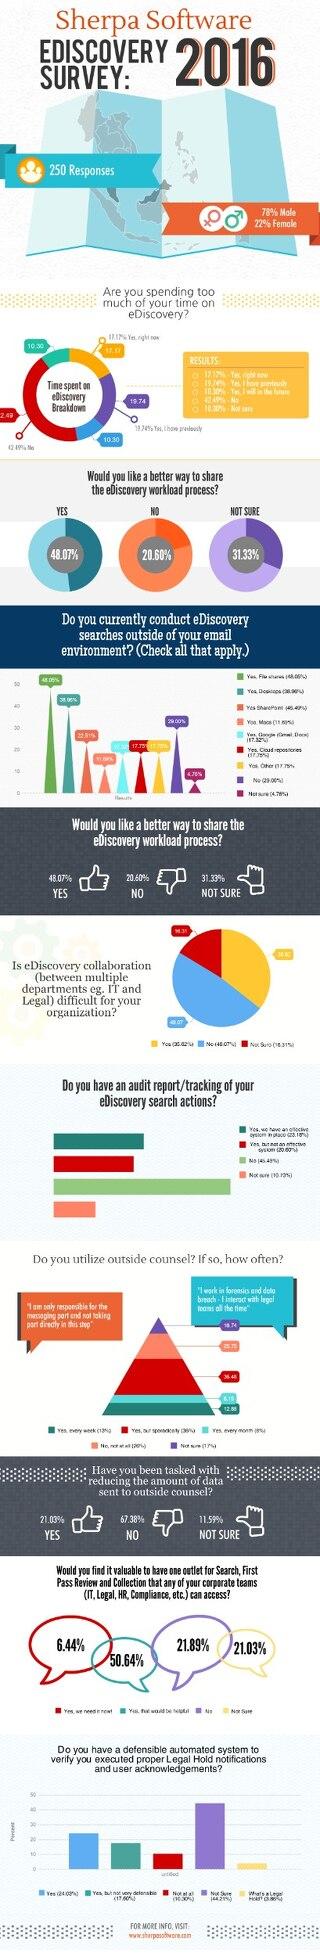 2016 eDiscovery Survey